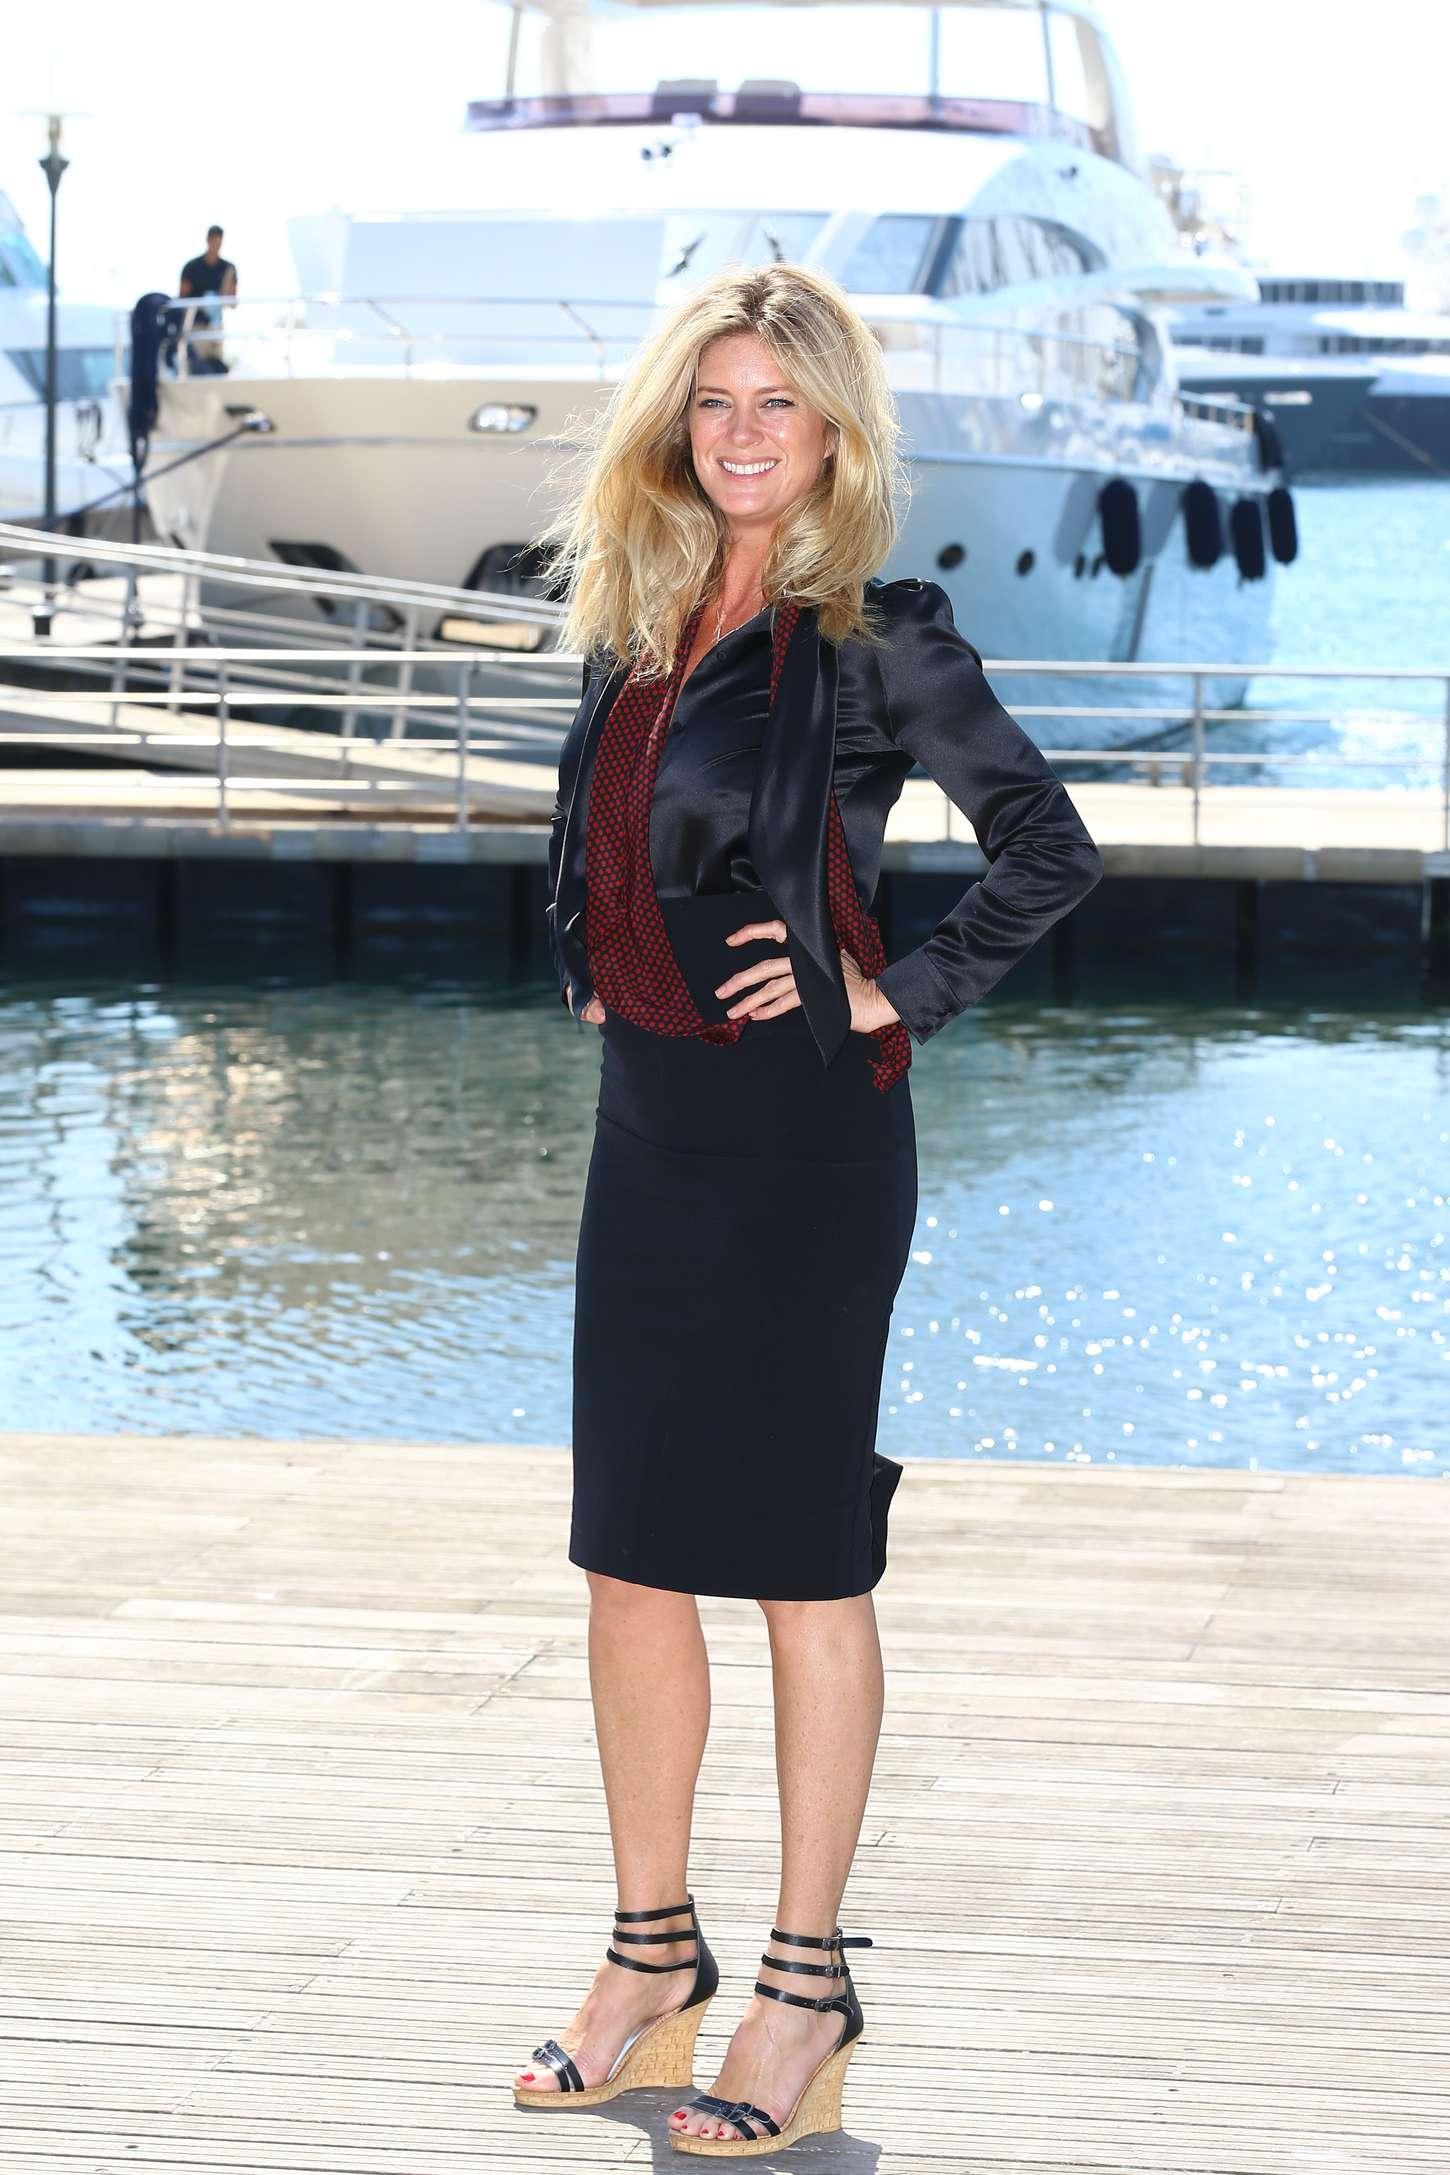 Rachel Hunter Rachels Tour Of Beauty Photocall at MIPTV in Cannes